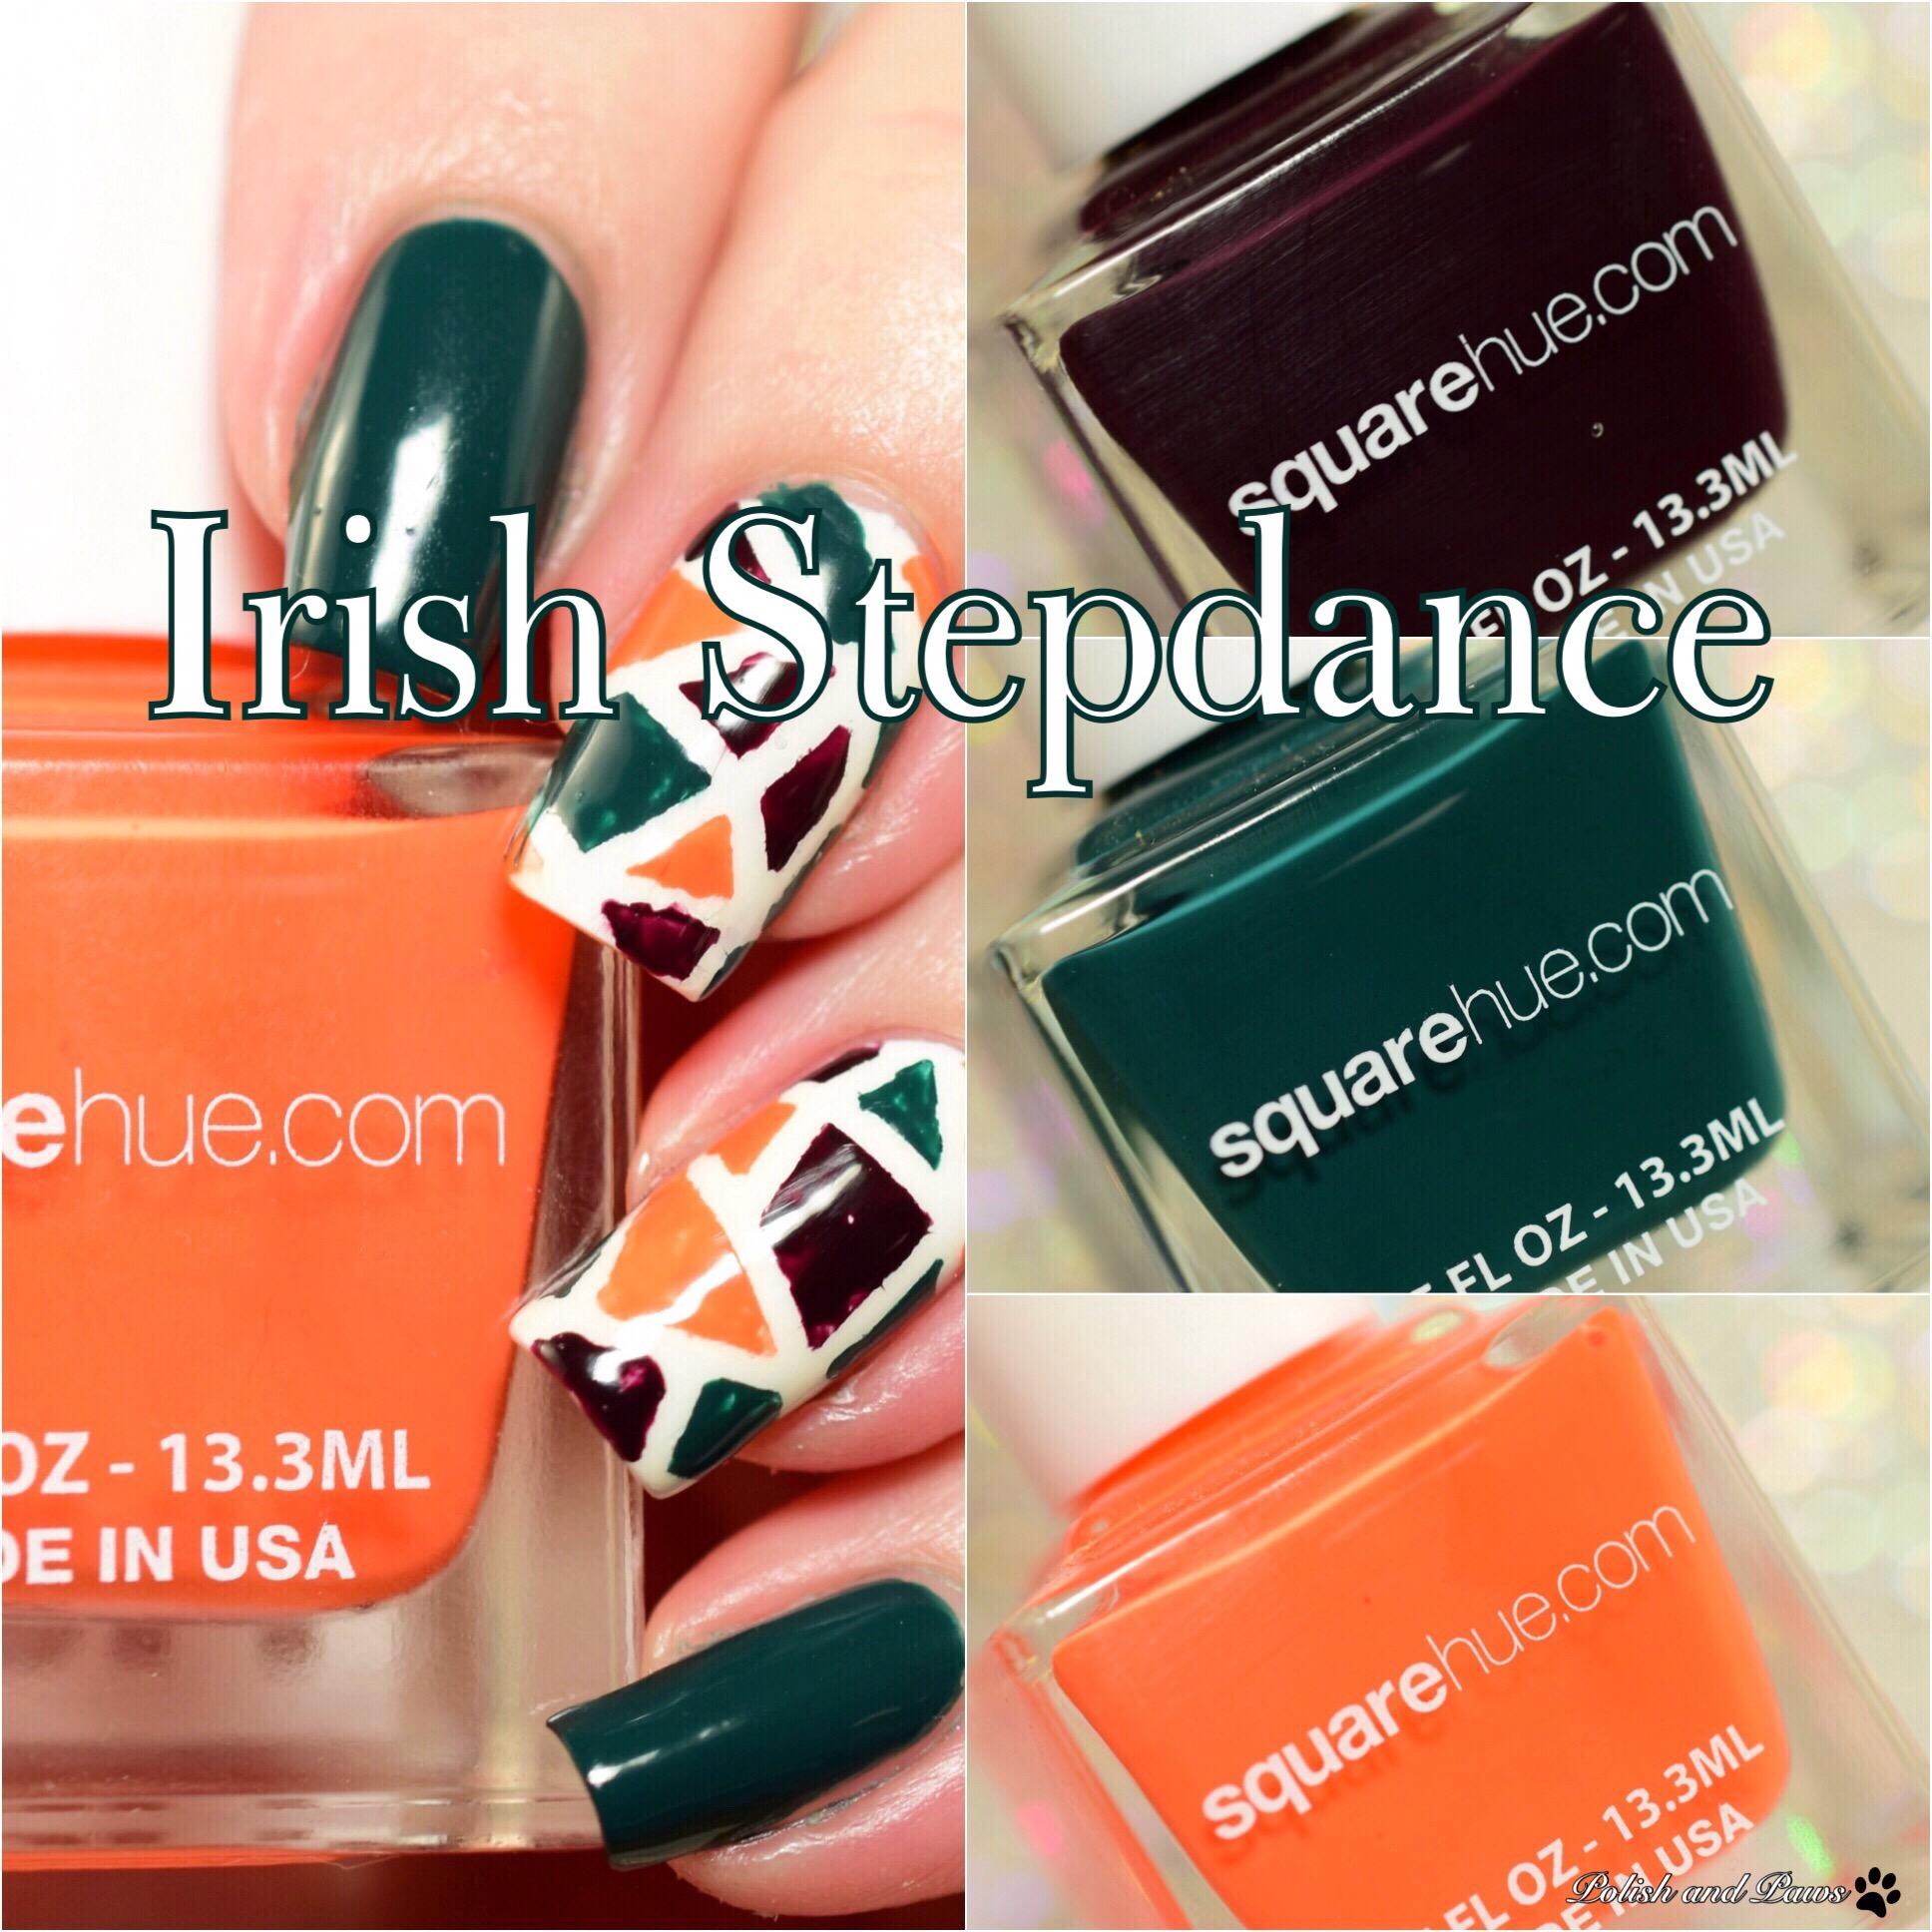 Square Hue Irish Stepdance Collection